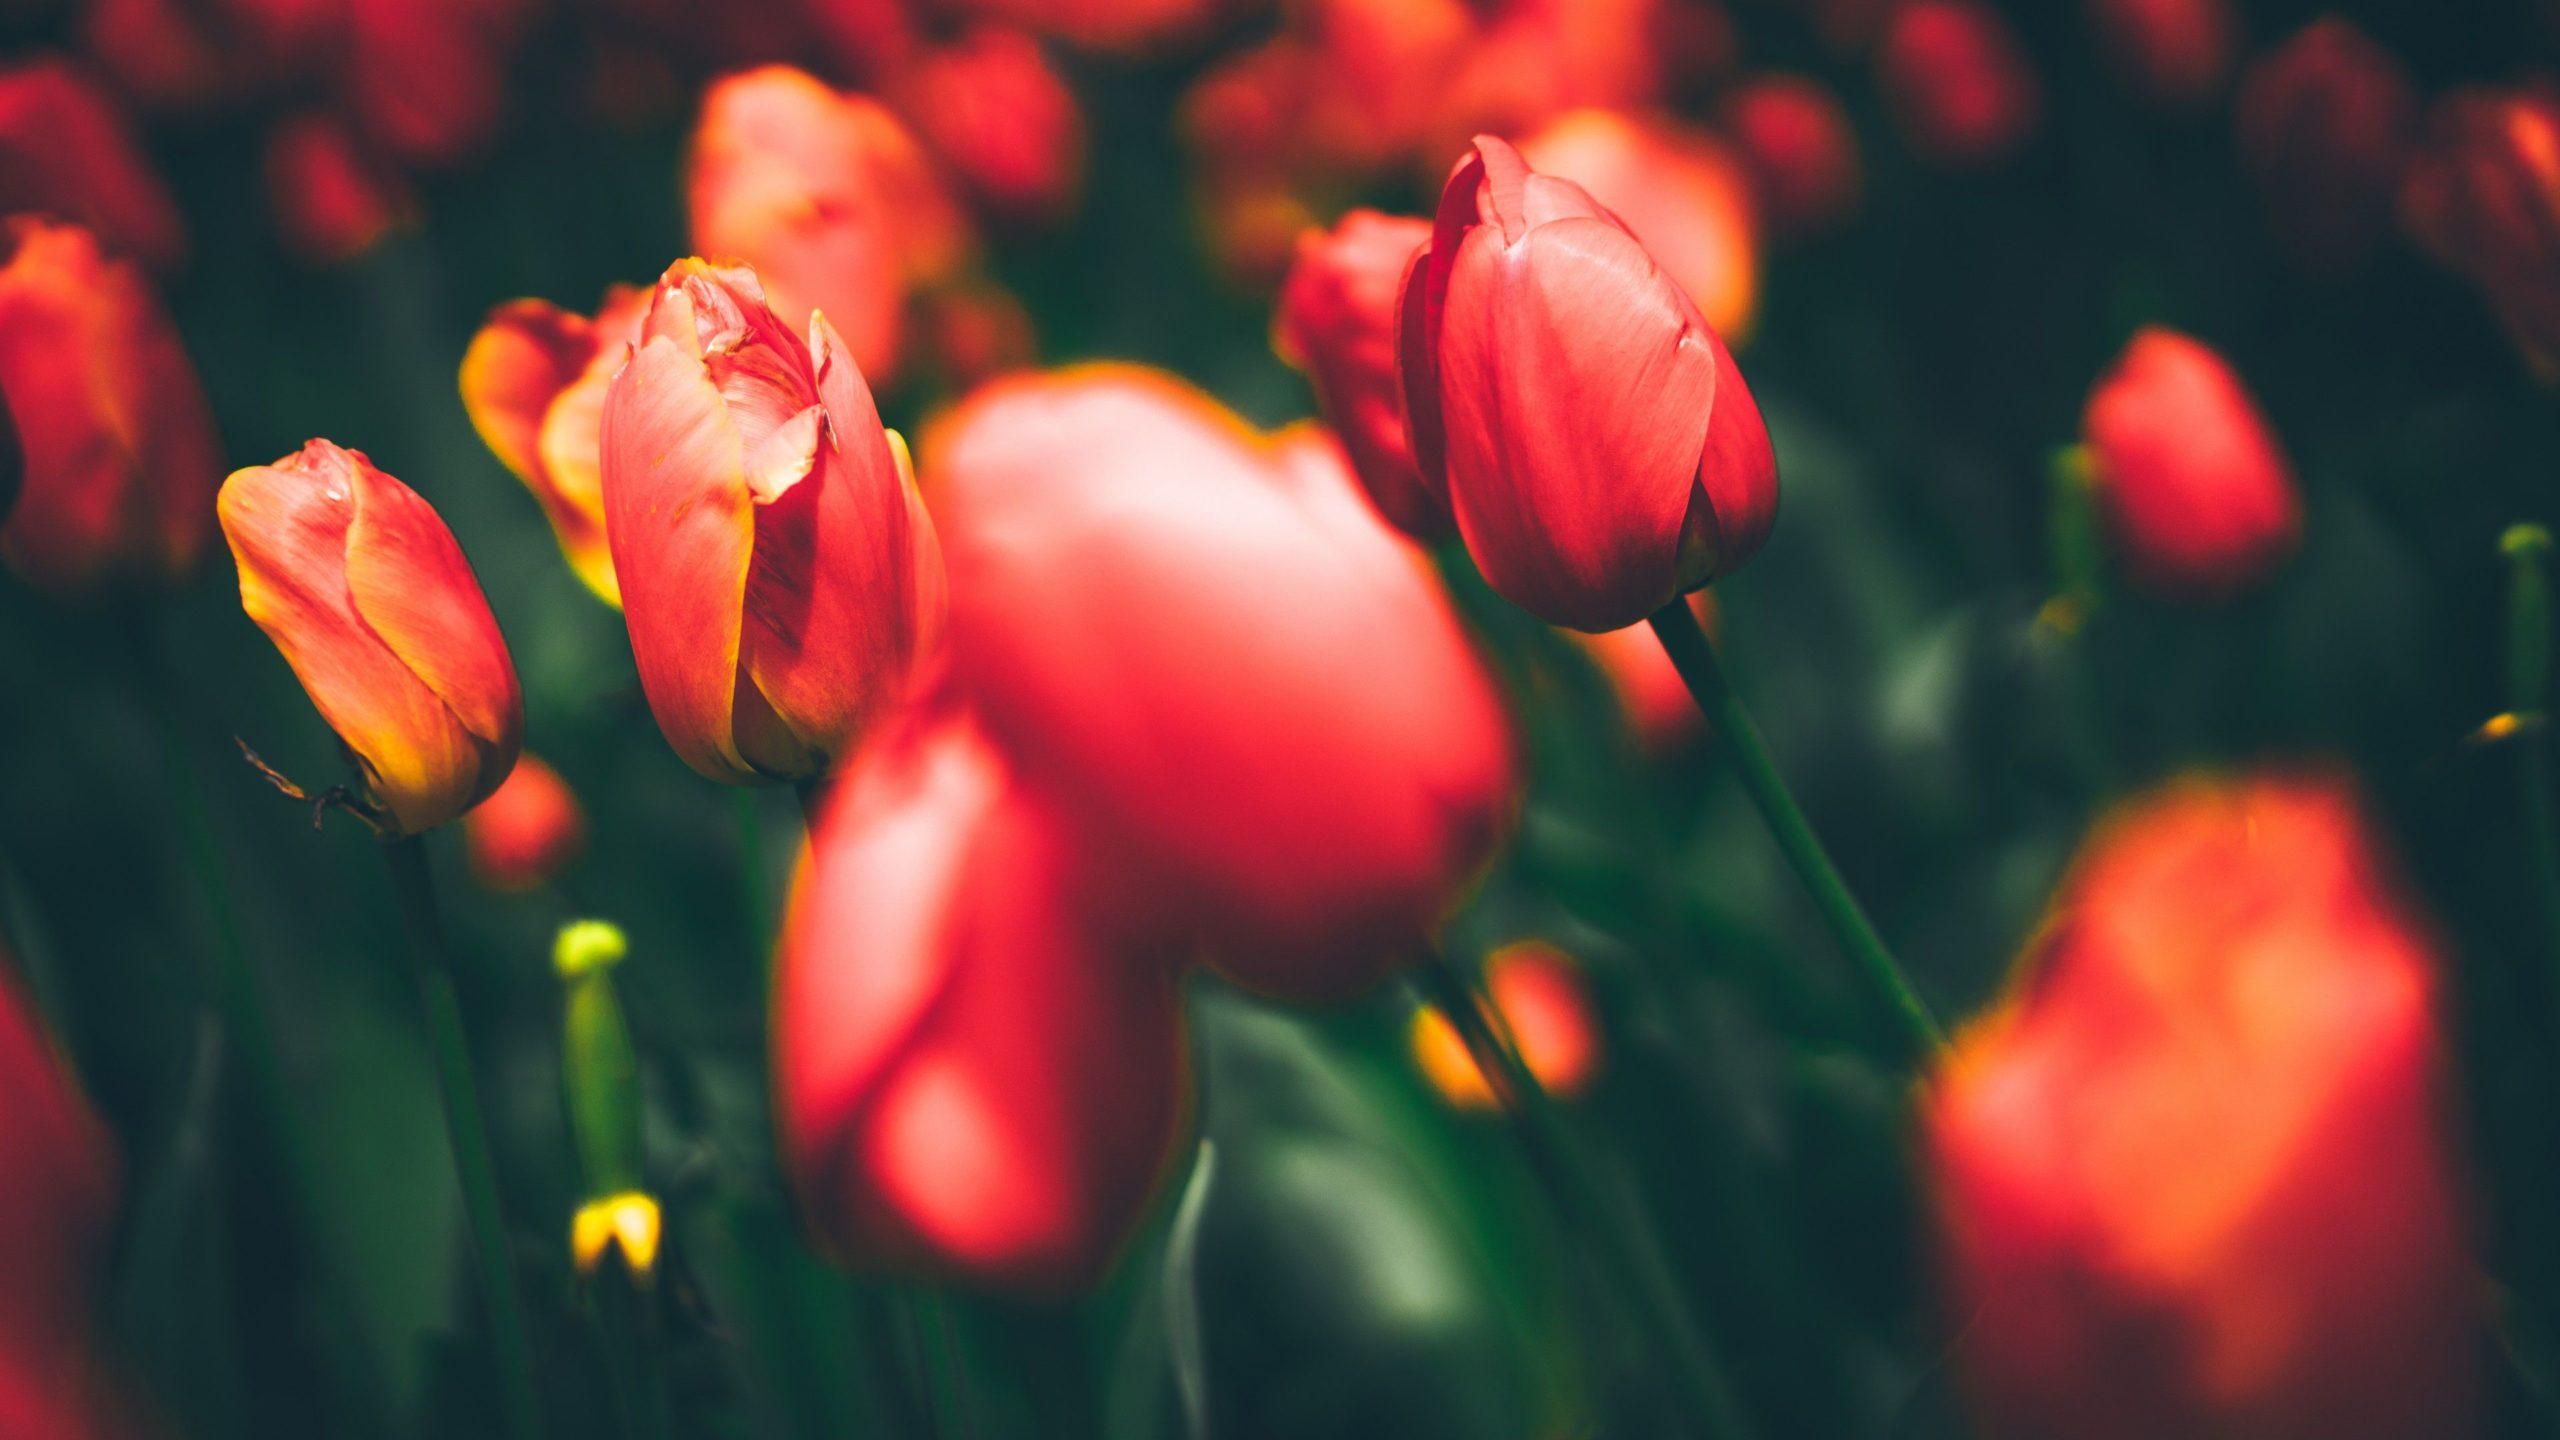 tulips photography hd